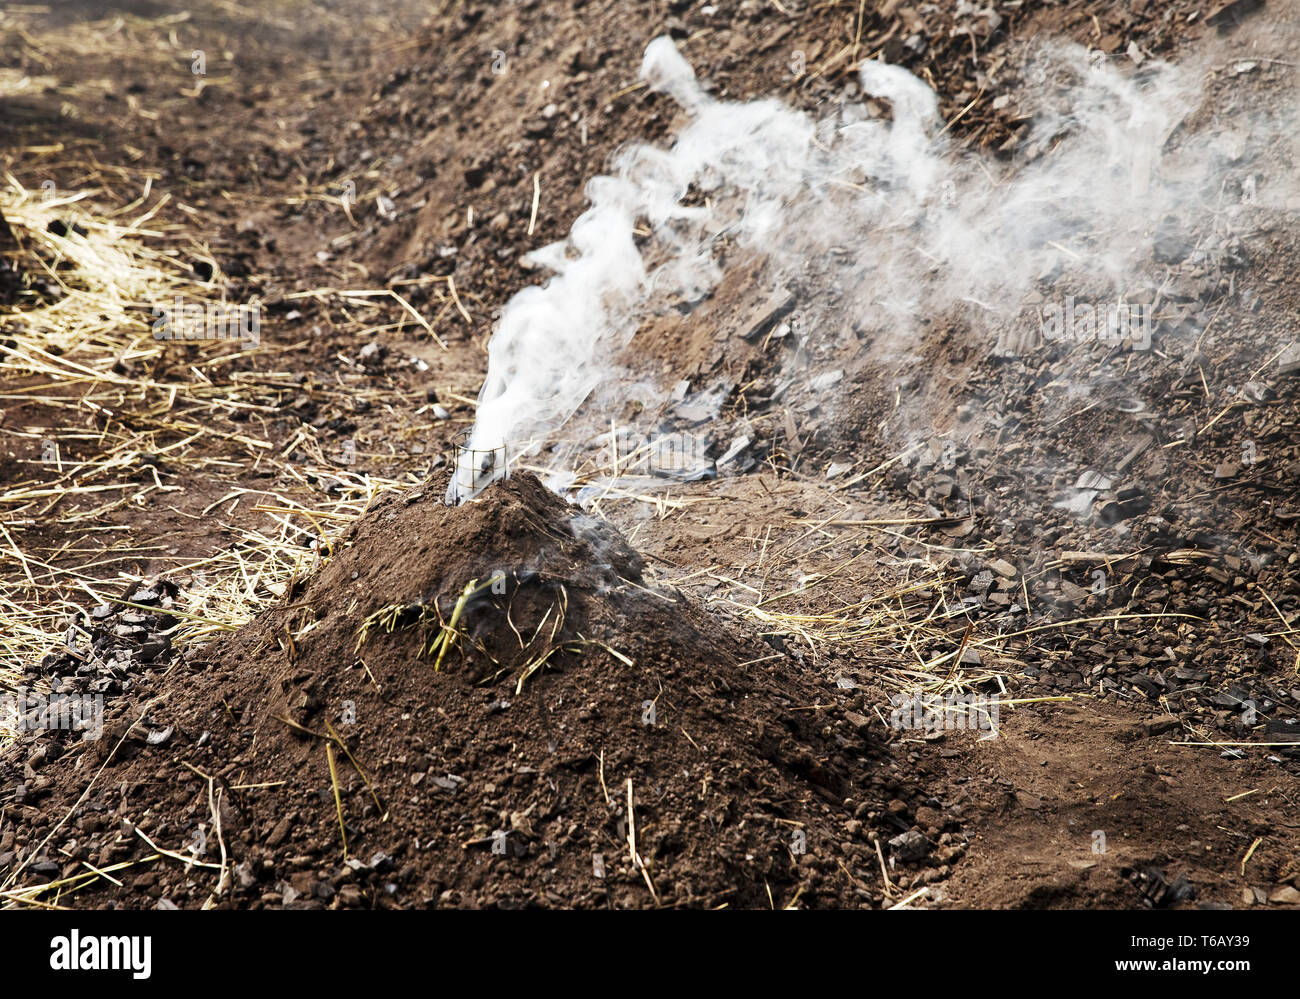 little smoking charcoal pile, Ennepetal, Ruhr Area, North Rhine-Westphalia, Germany - Stock Image